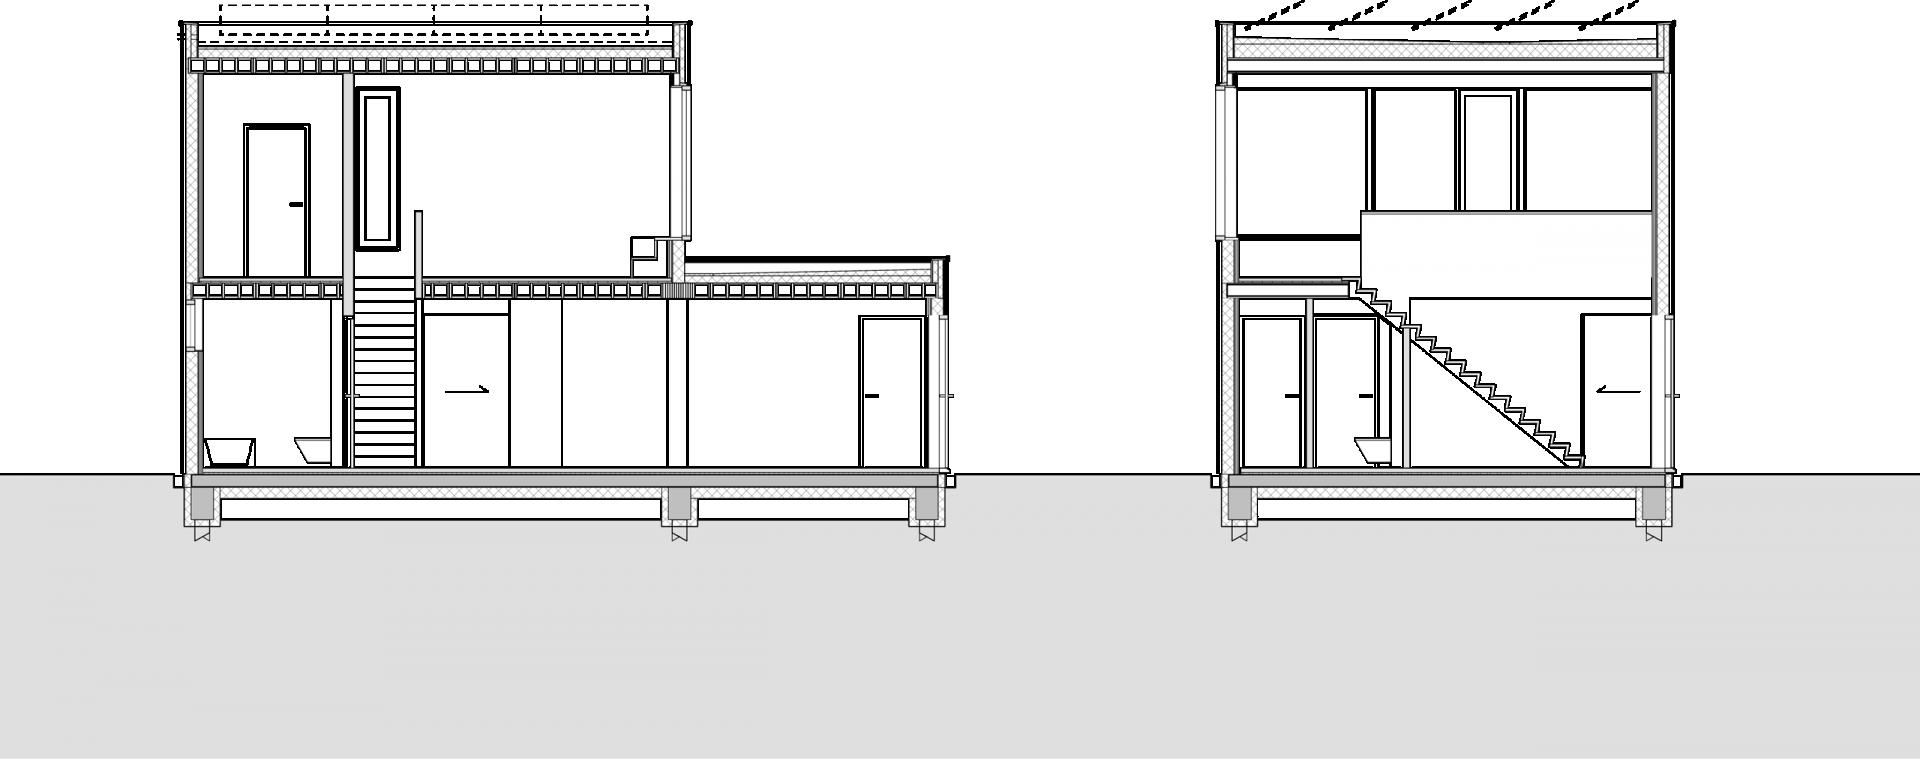 Leonidas Section